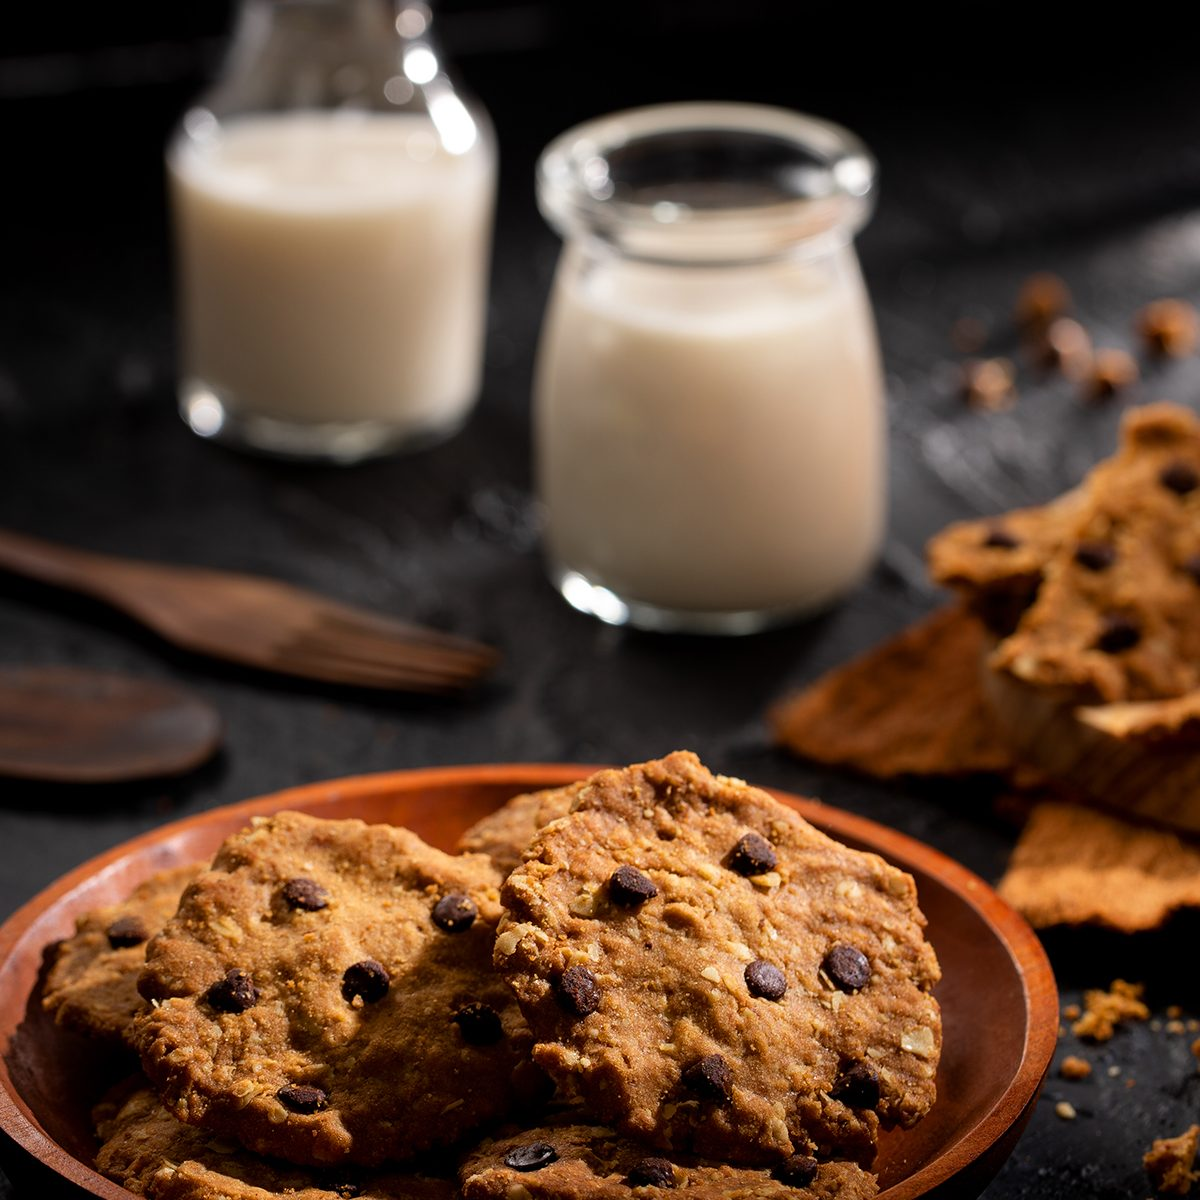 Chocolate Chip Cookies (Jakarta Food Photographer)